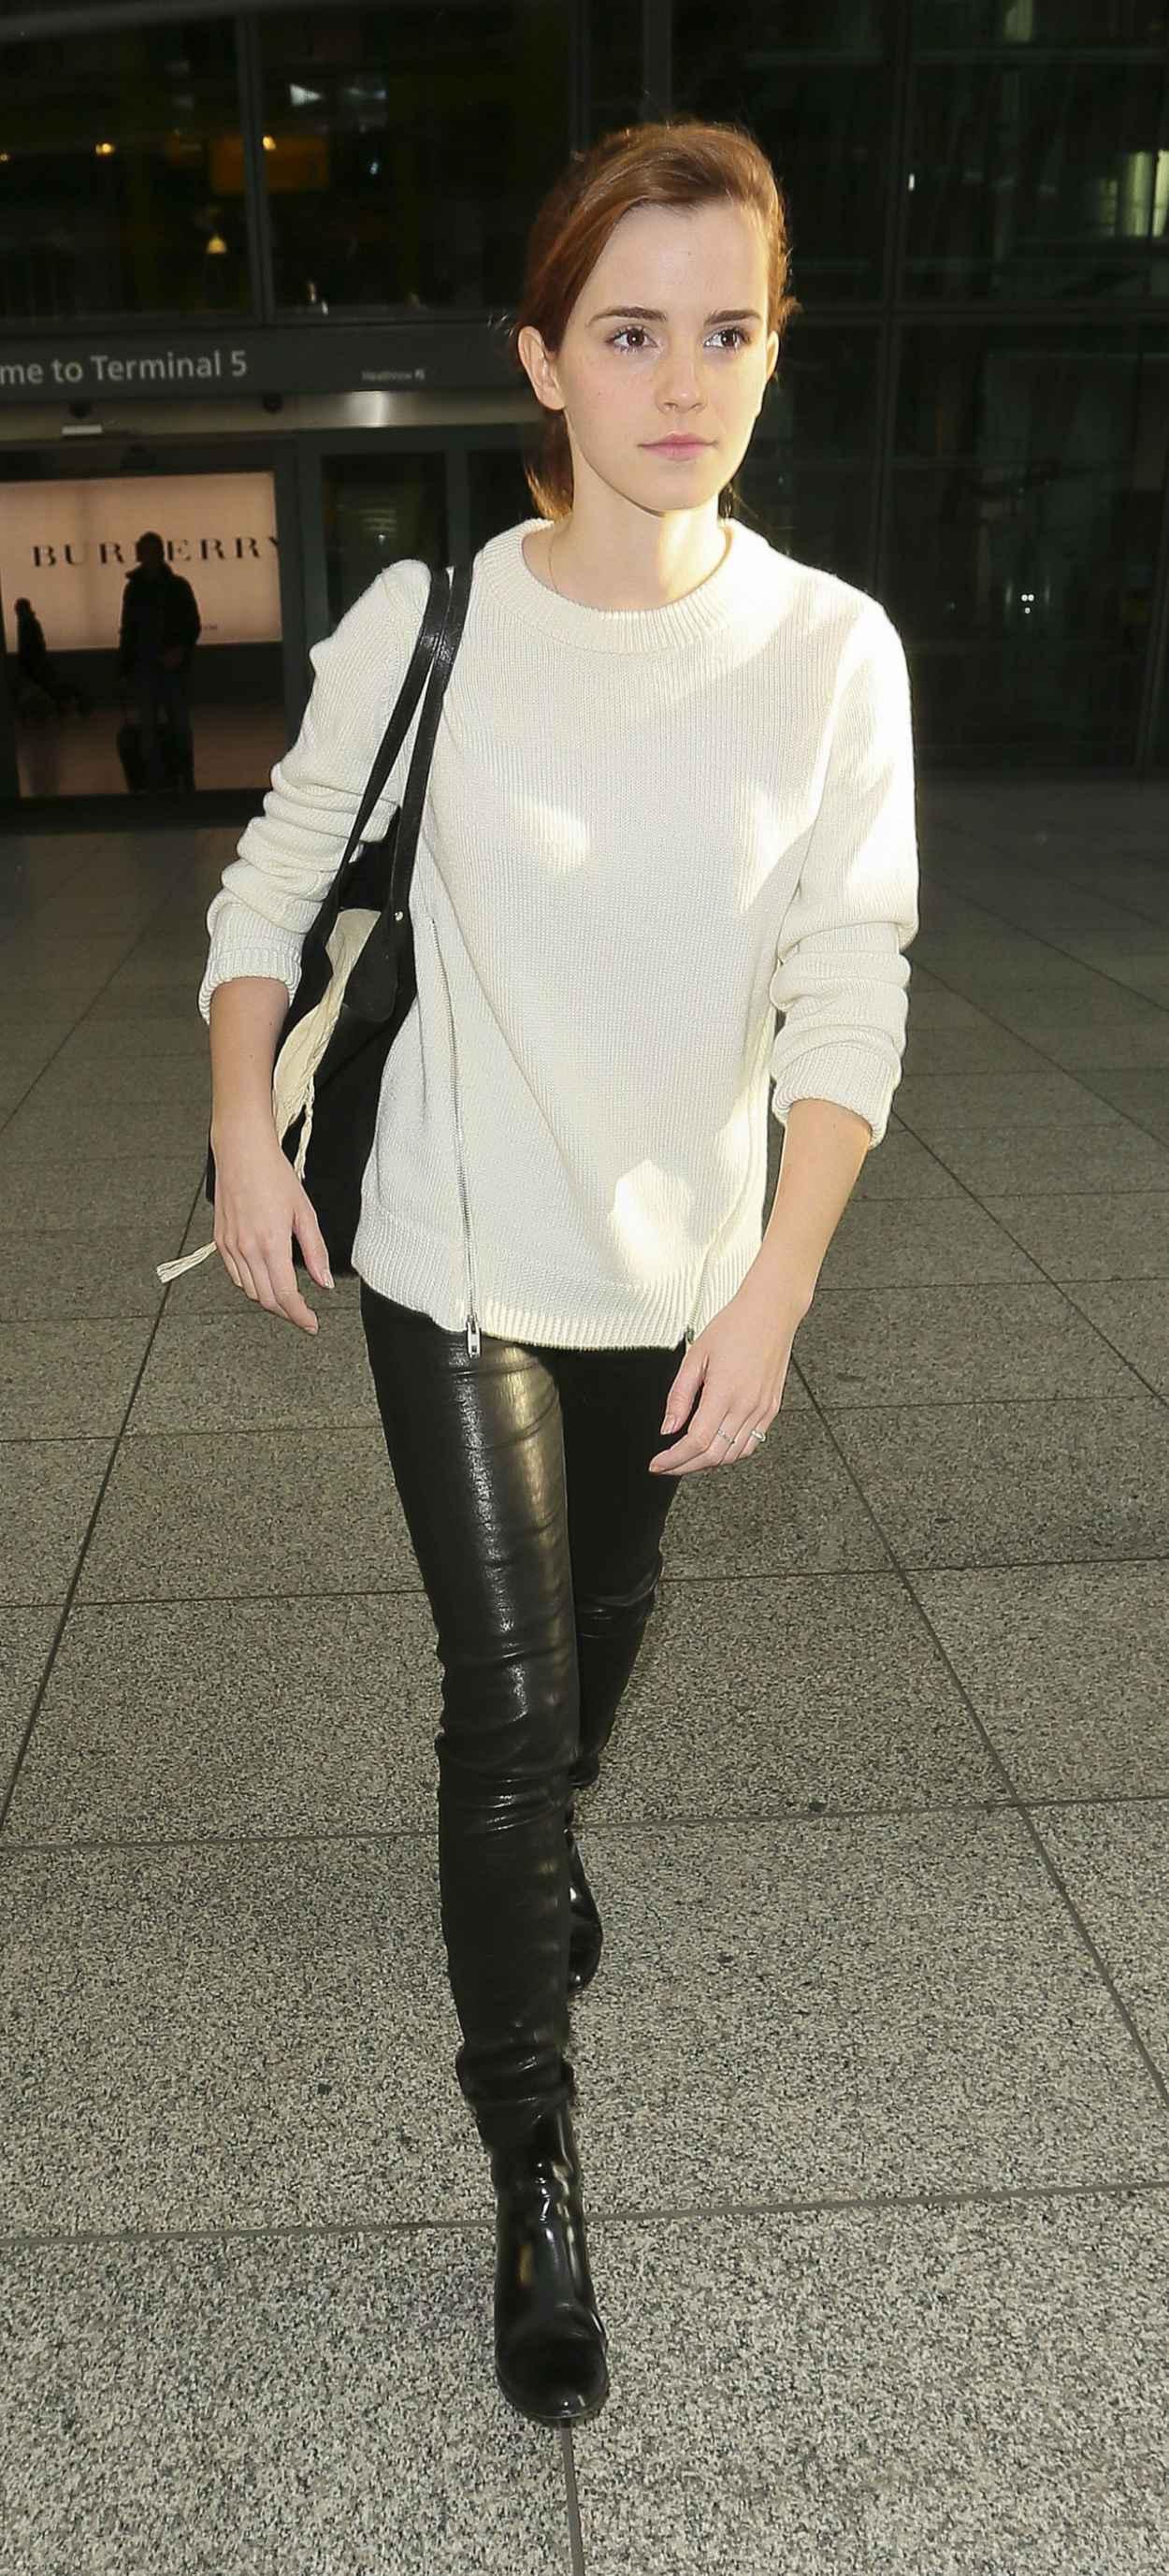 Emma Watson Street Style - at Heathrow Airport in London - November 2015-1